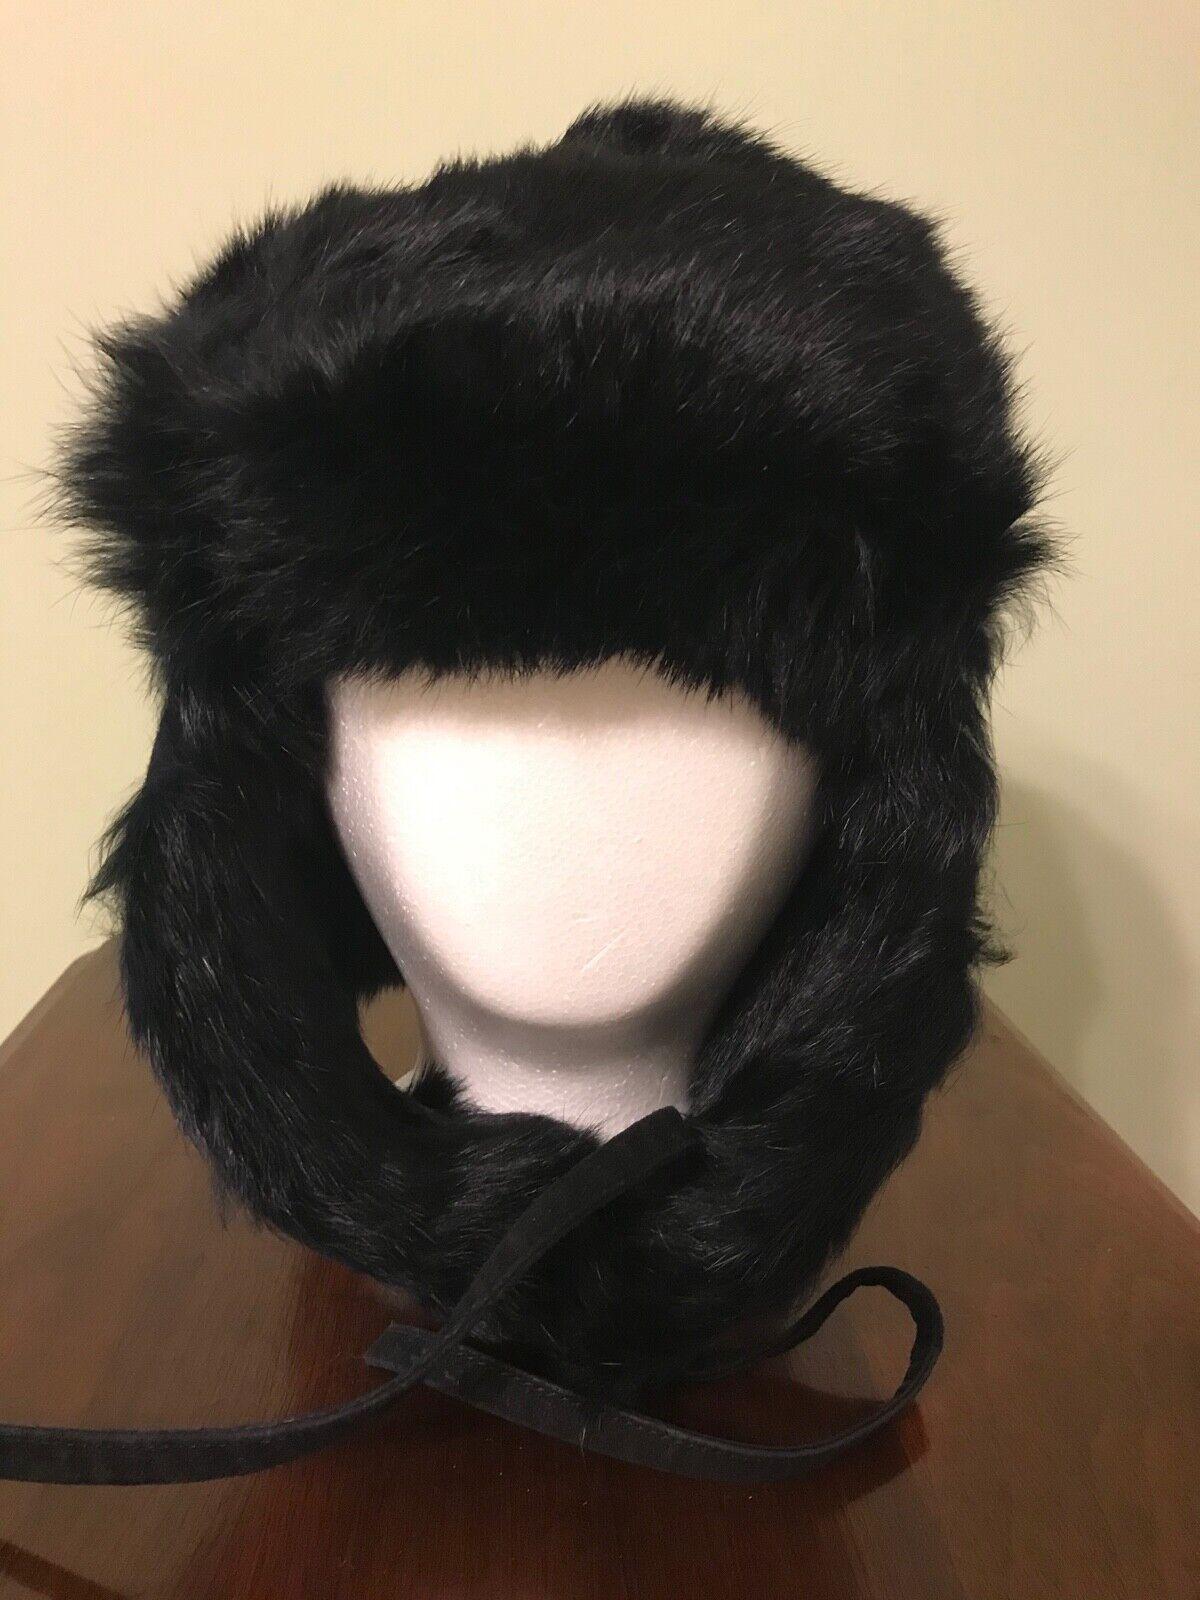 Vintage Black Mink Ladies' Hat with Flap Ear Muffs - image 5